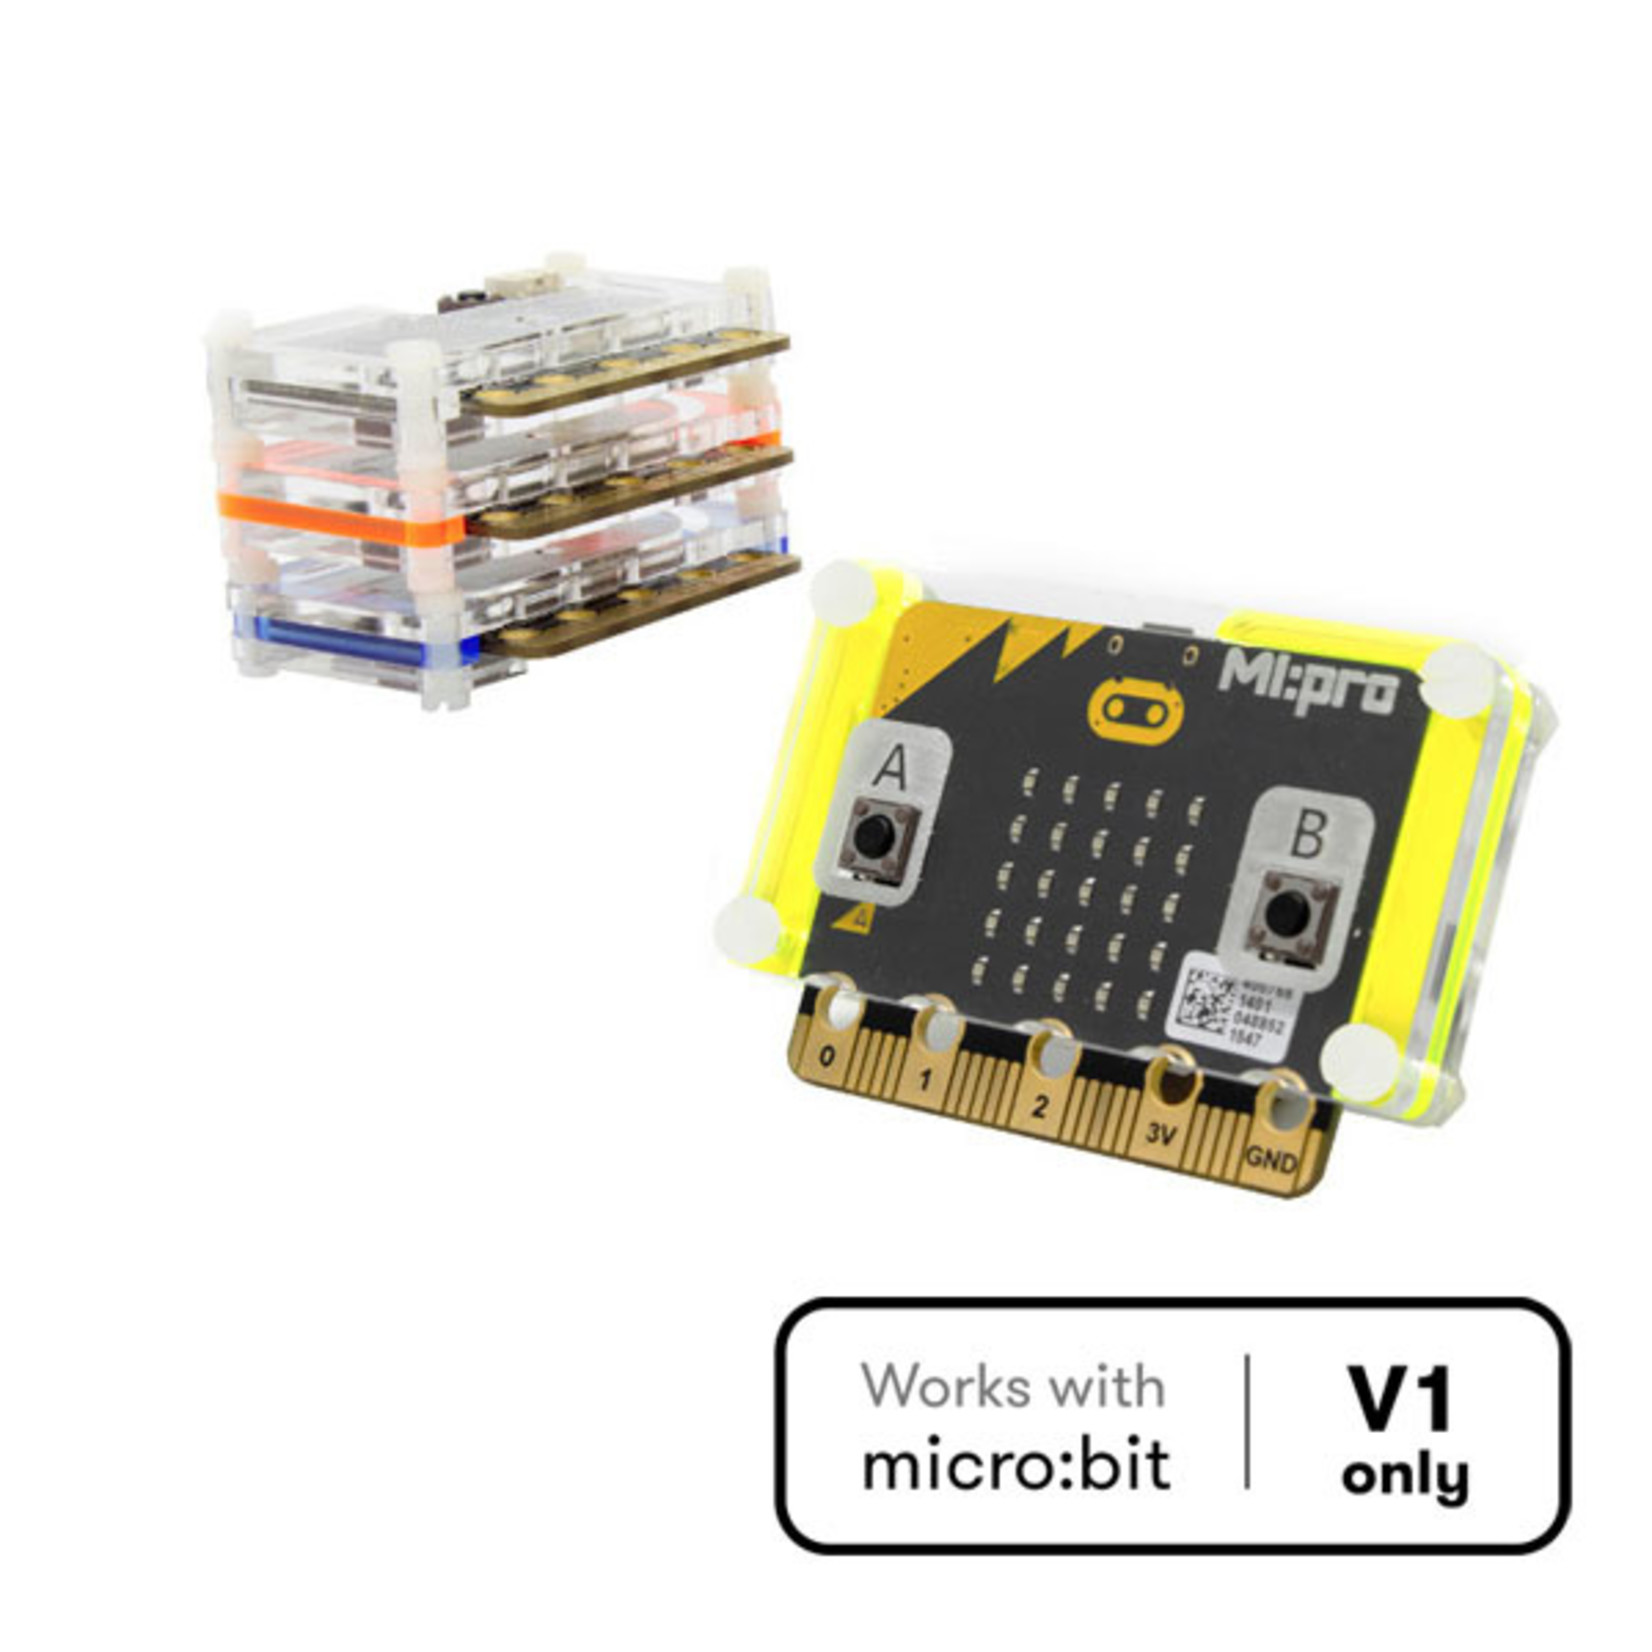 Kitronik MI:pro Protector Case for the BBC micro:bit - Orange